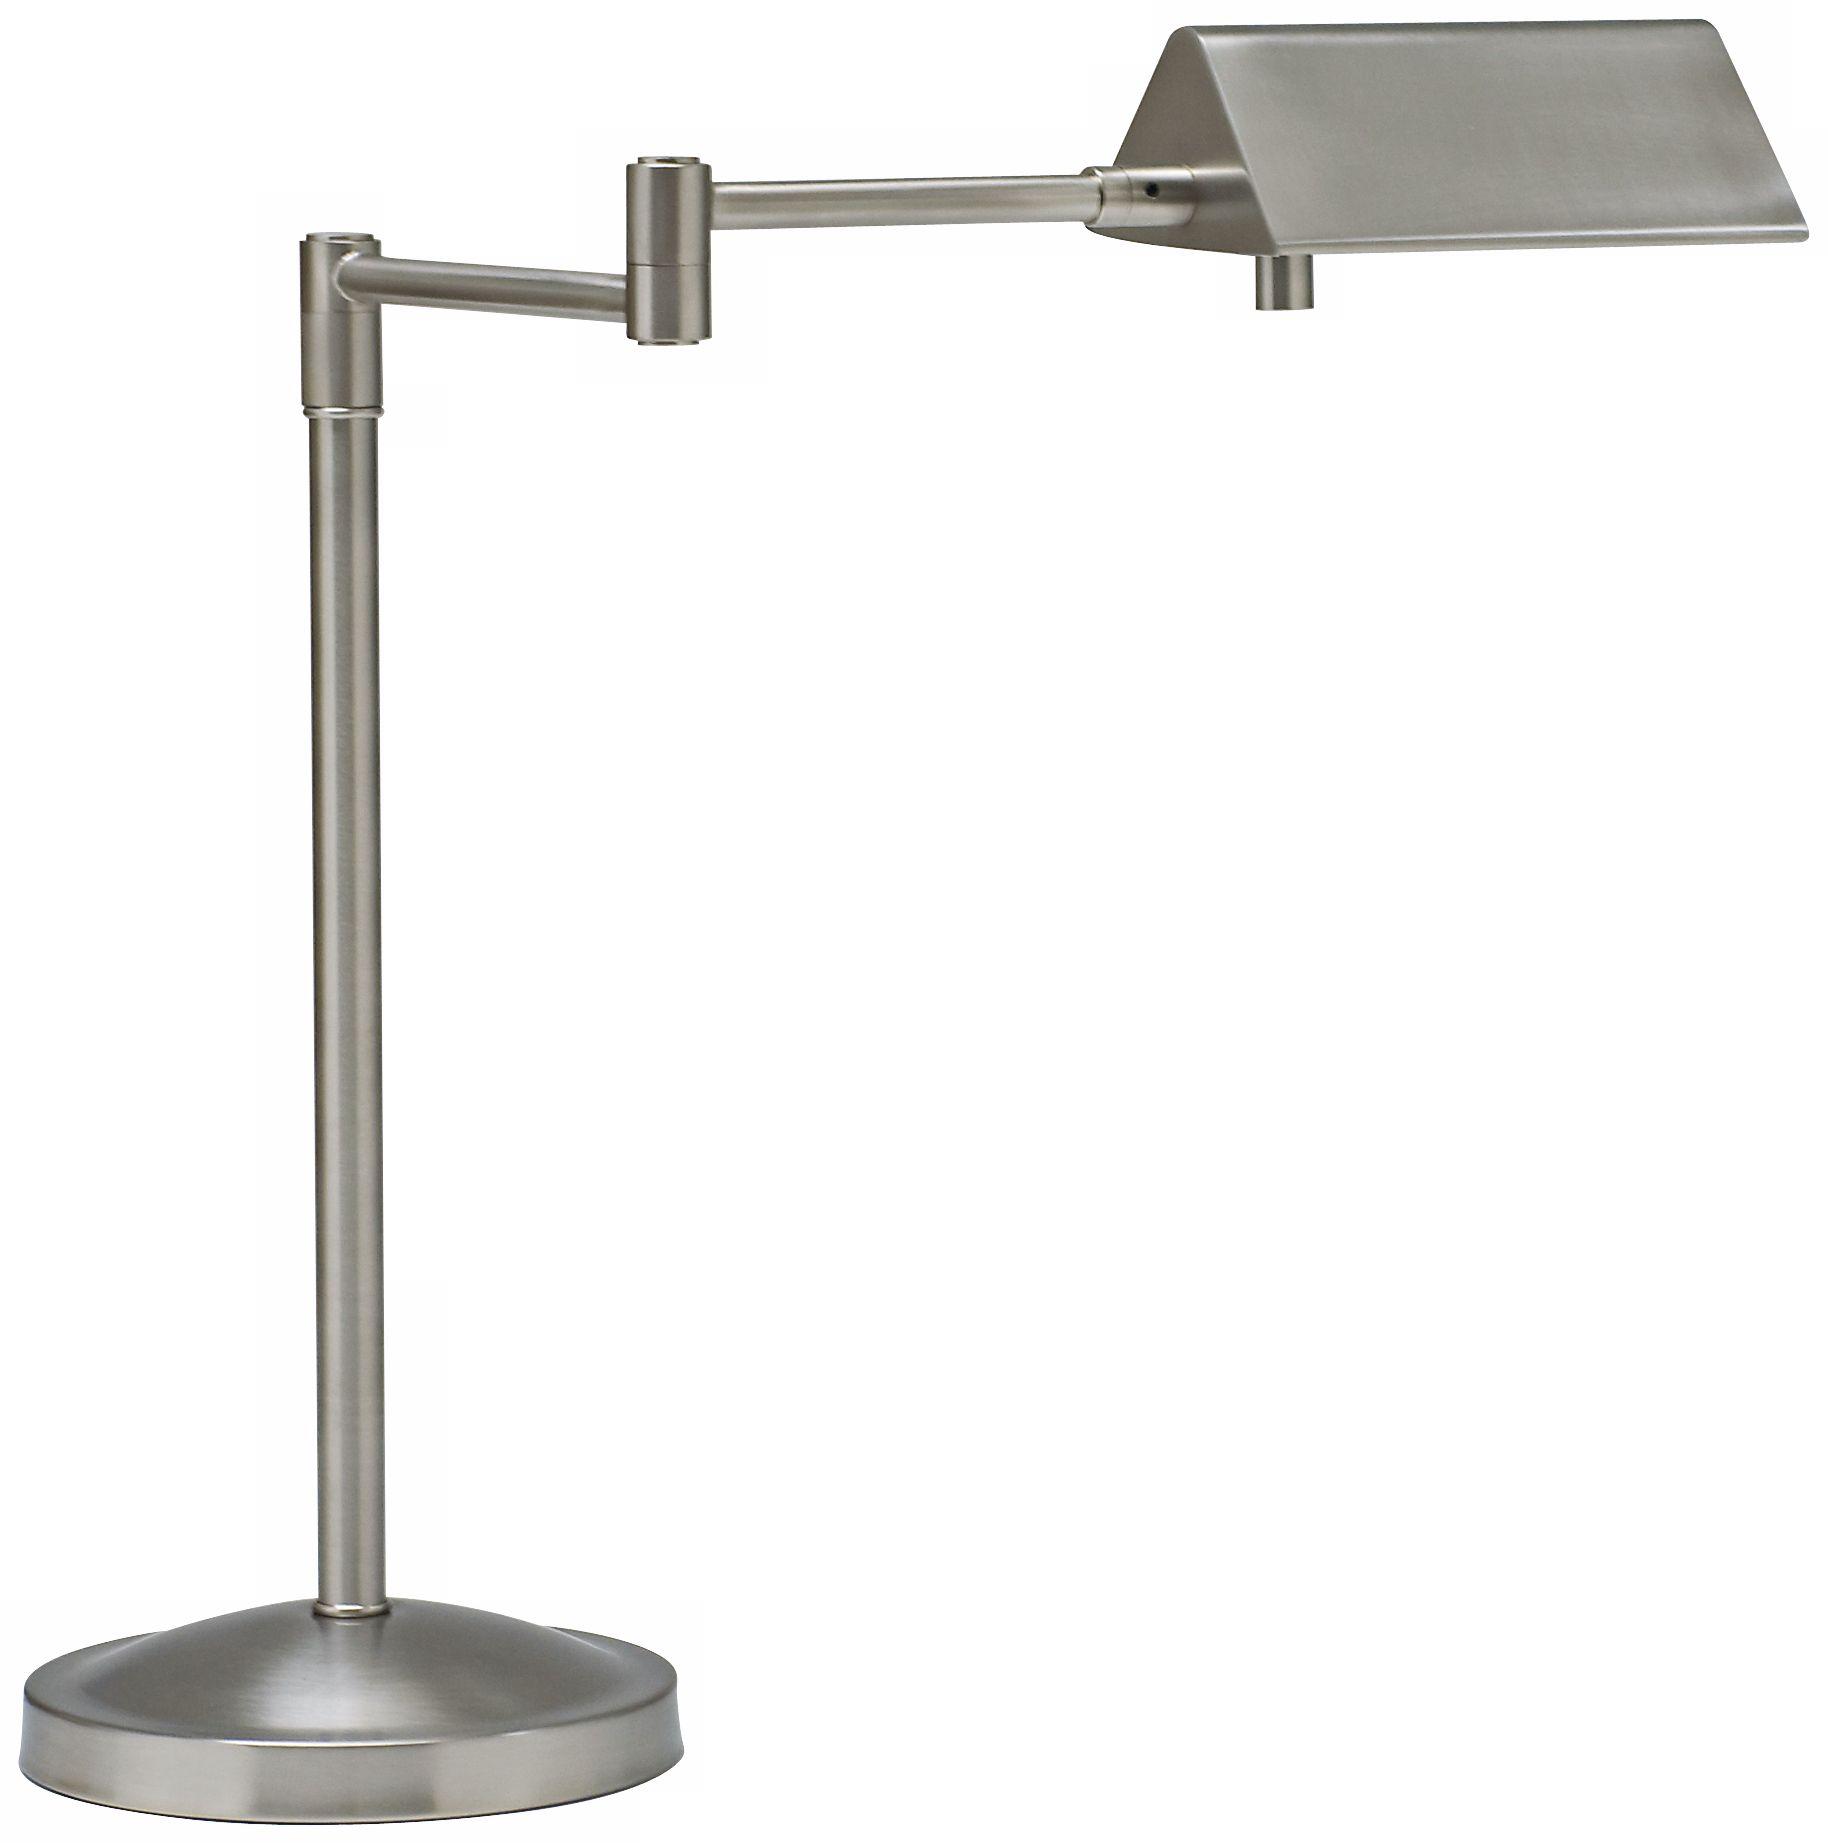 Charmant House Of Troy Pinnacle Satin Nickel Swing Arm Desk Lamp